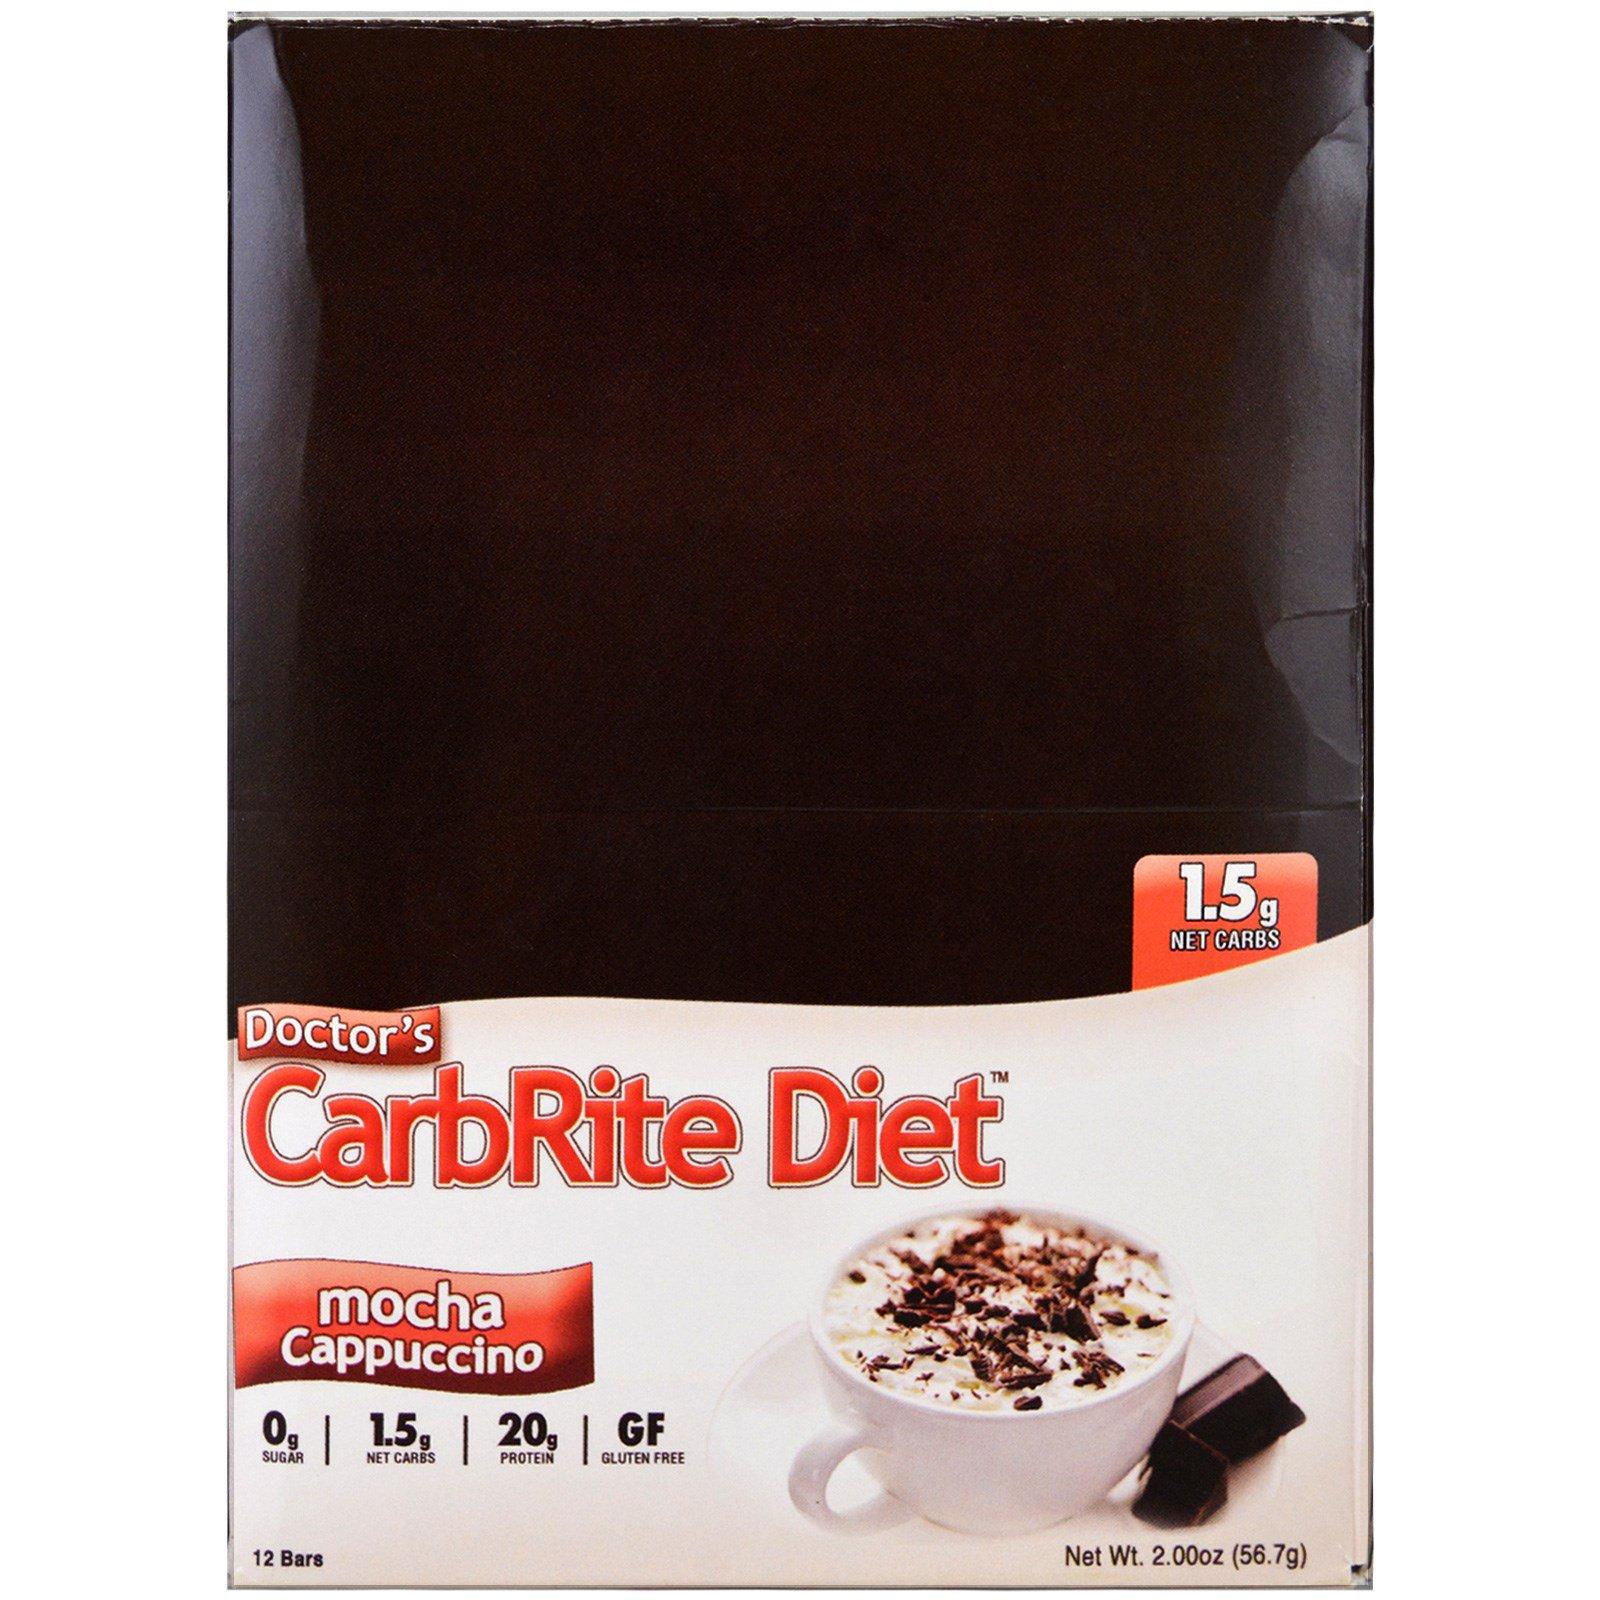 Universal Nutrition, Doctor's CarbRite Diet, мокко капучино, 12 батончиков, 2.00 унции (56.7 г)